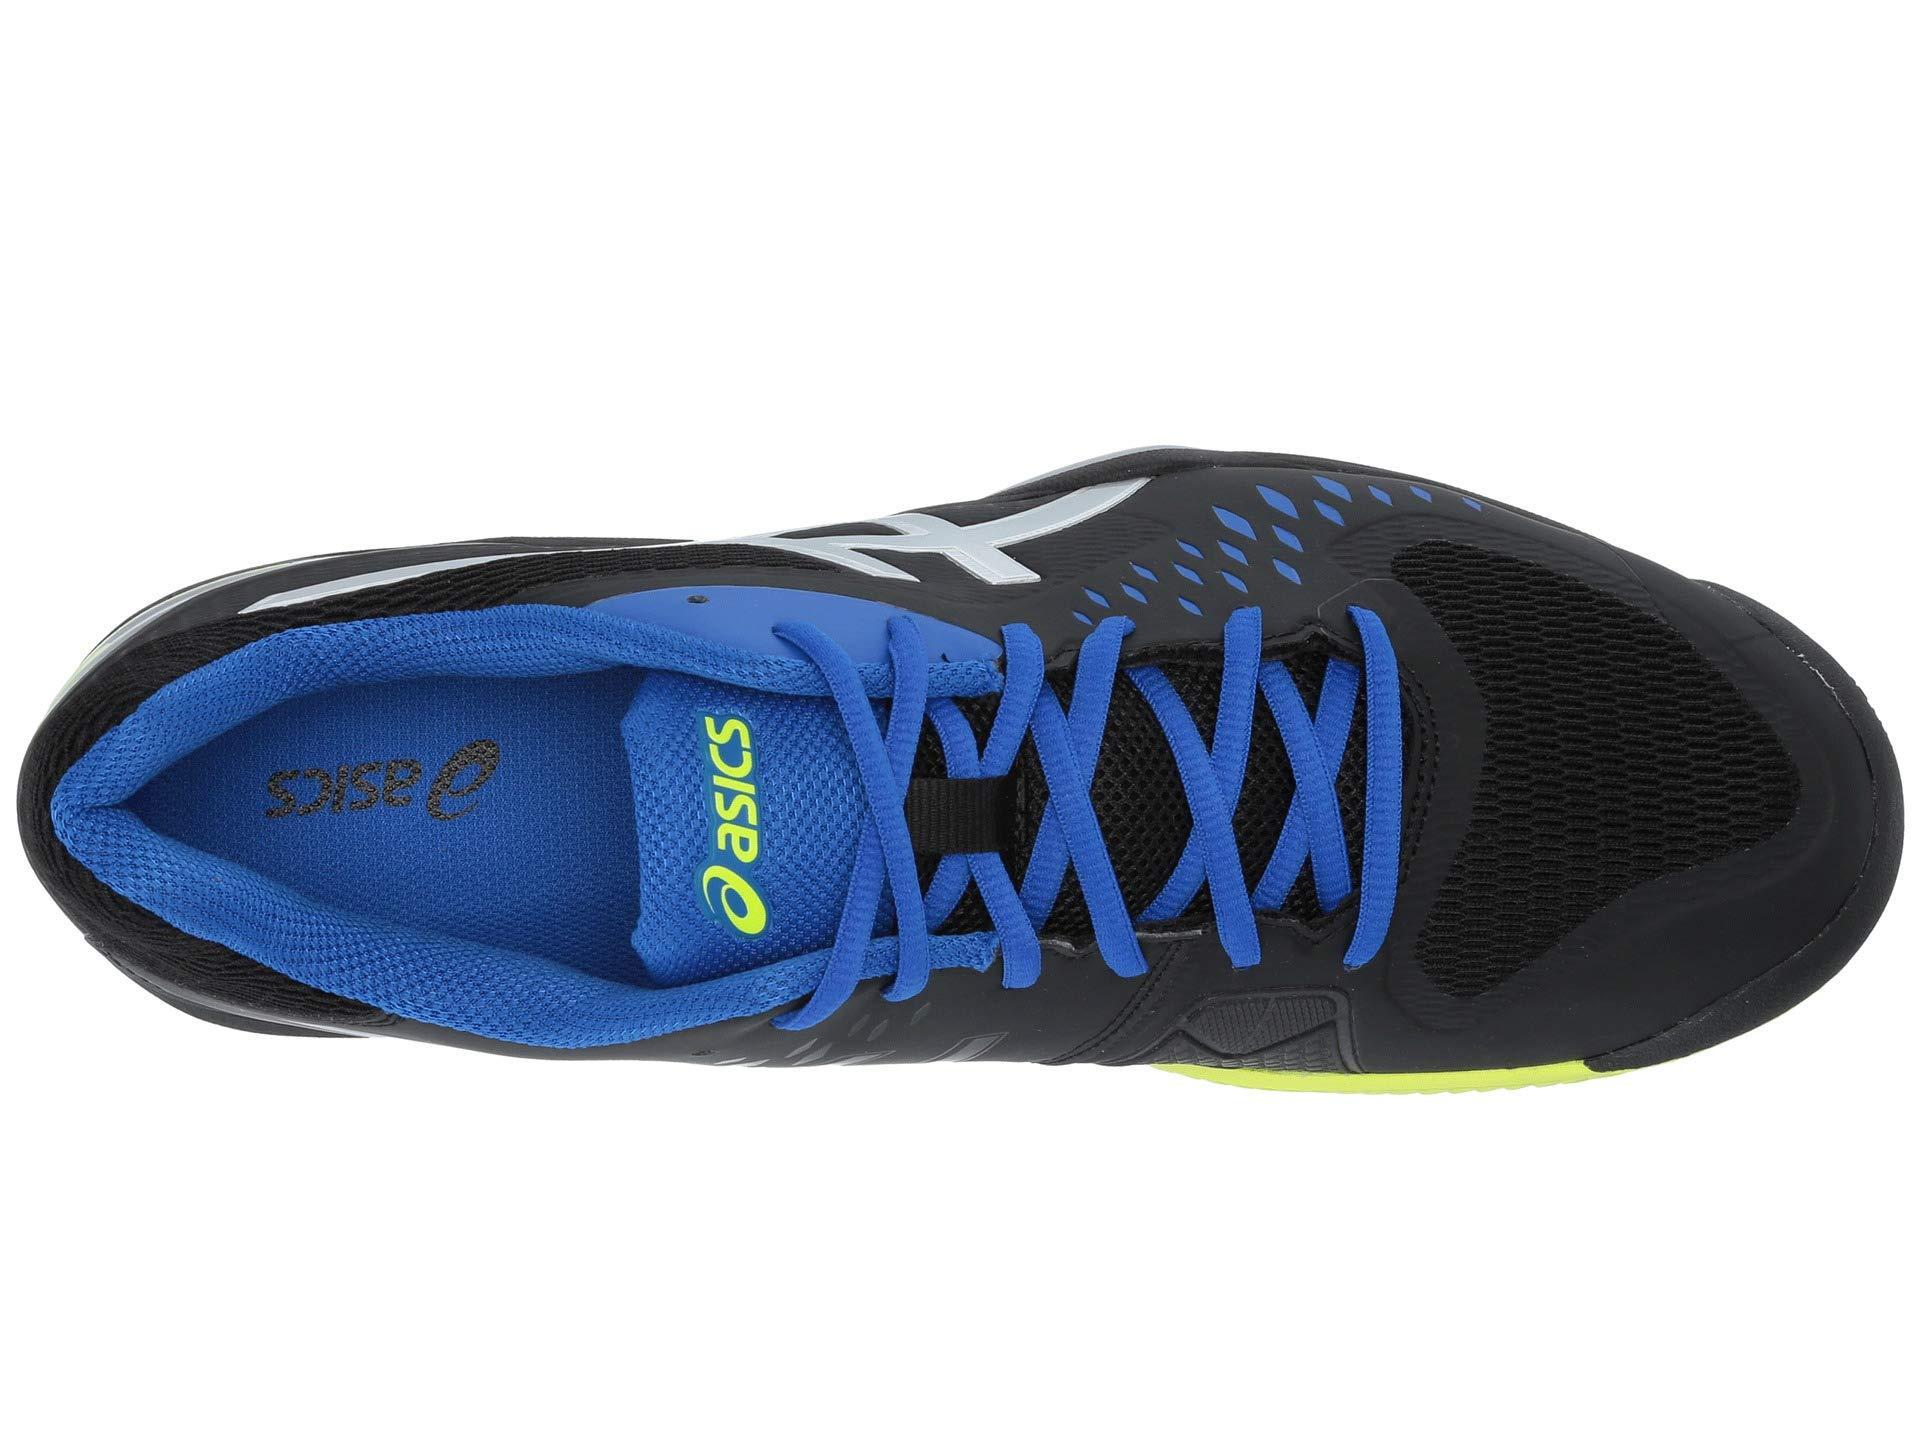 huge discount e5a1a 21cc4 Asics - Gel-challenger 12 Clay (black silver) Men s Tennis Shoes for. View  fullscreen